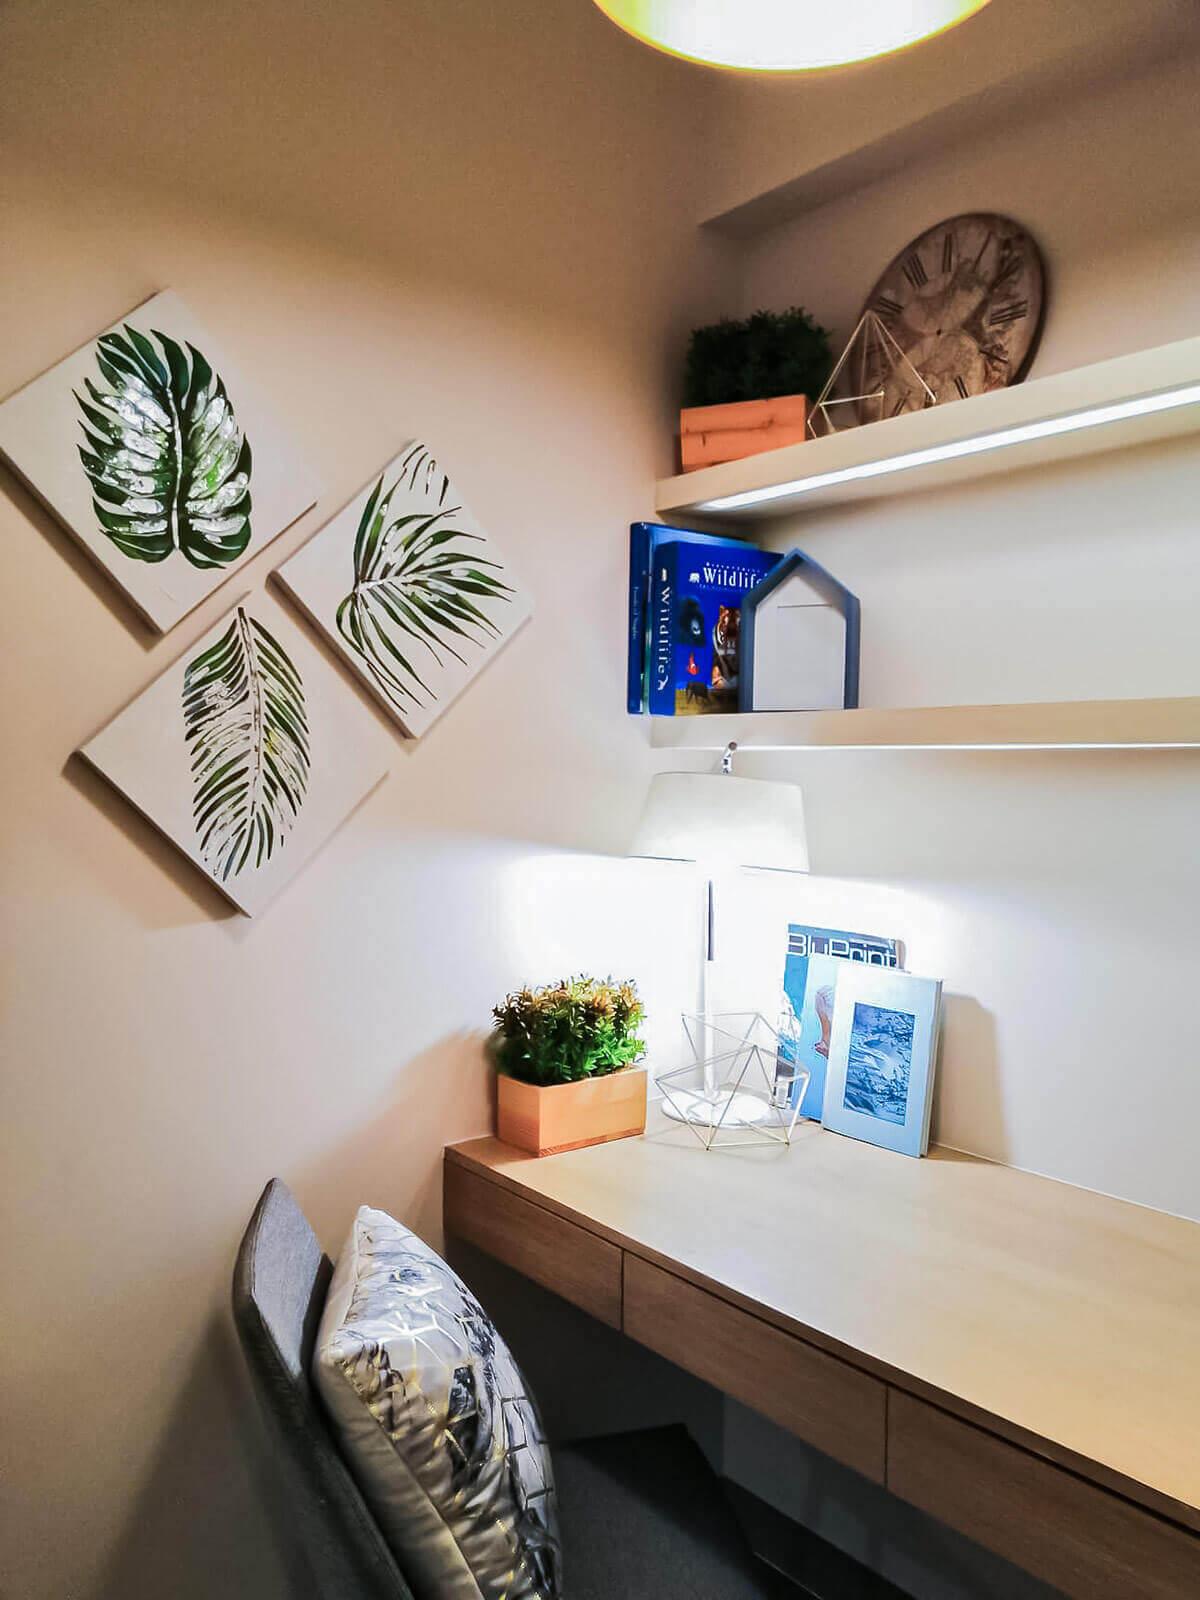 Top Interior Design Ideas For Your Condo